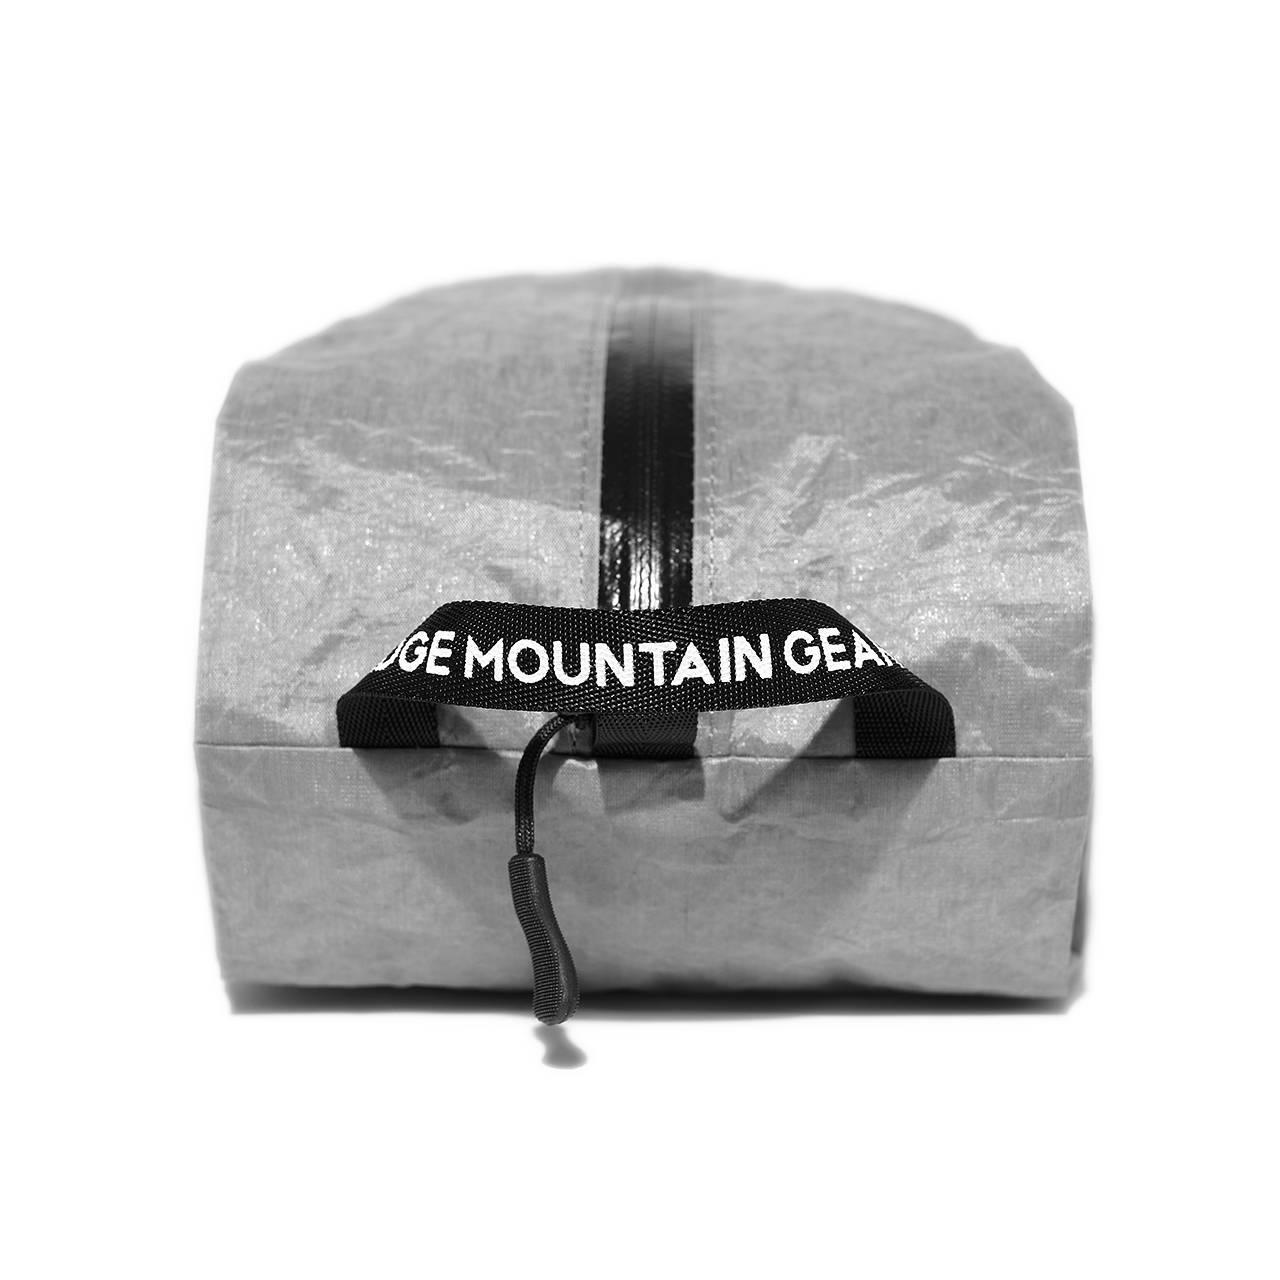 RIDGE MOUNTAIN GEAR(リッジマウンテンギア)/ケース L/グレー